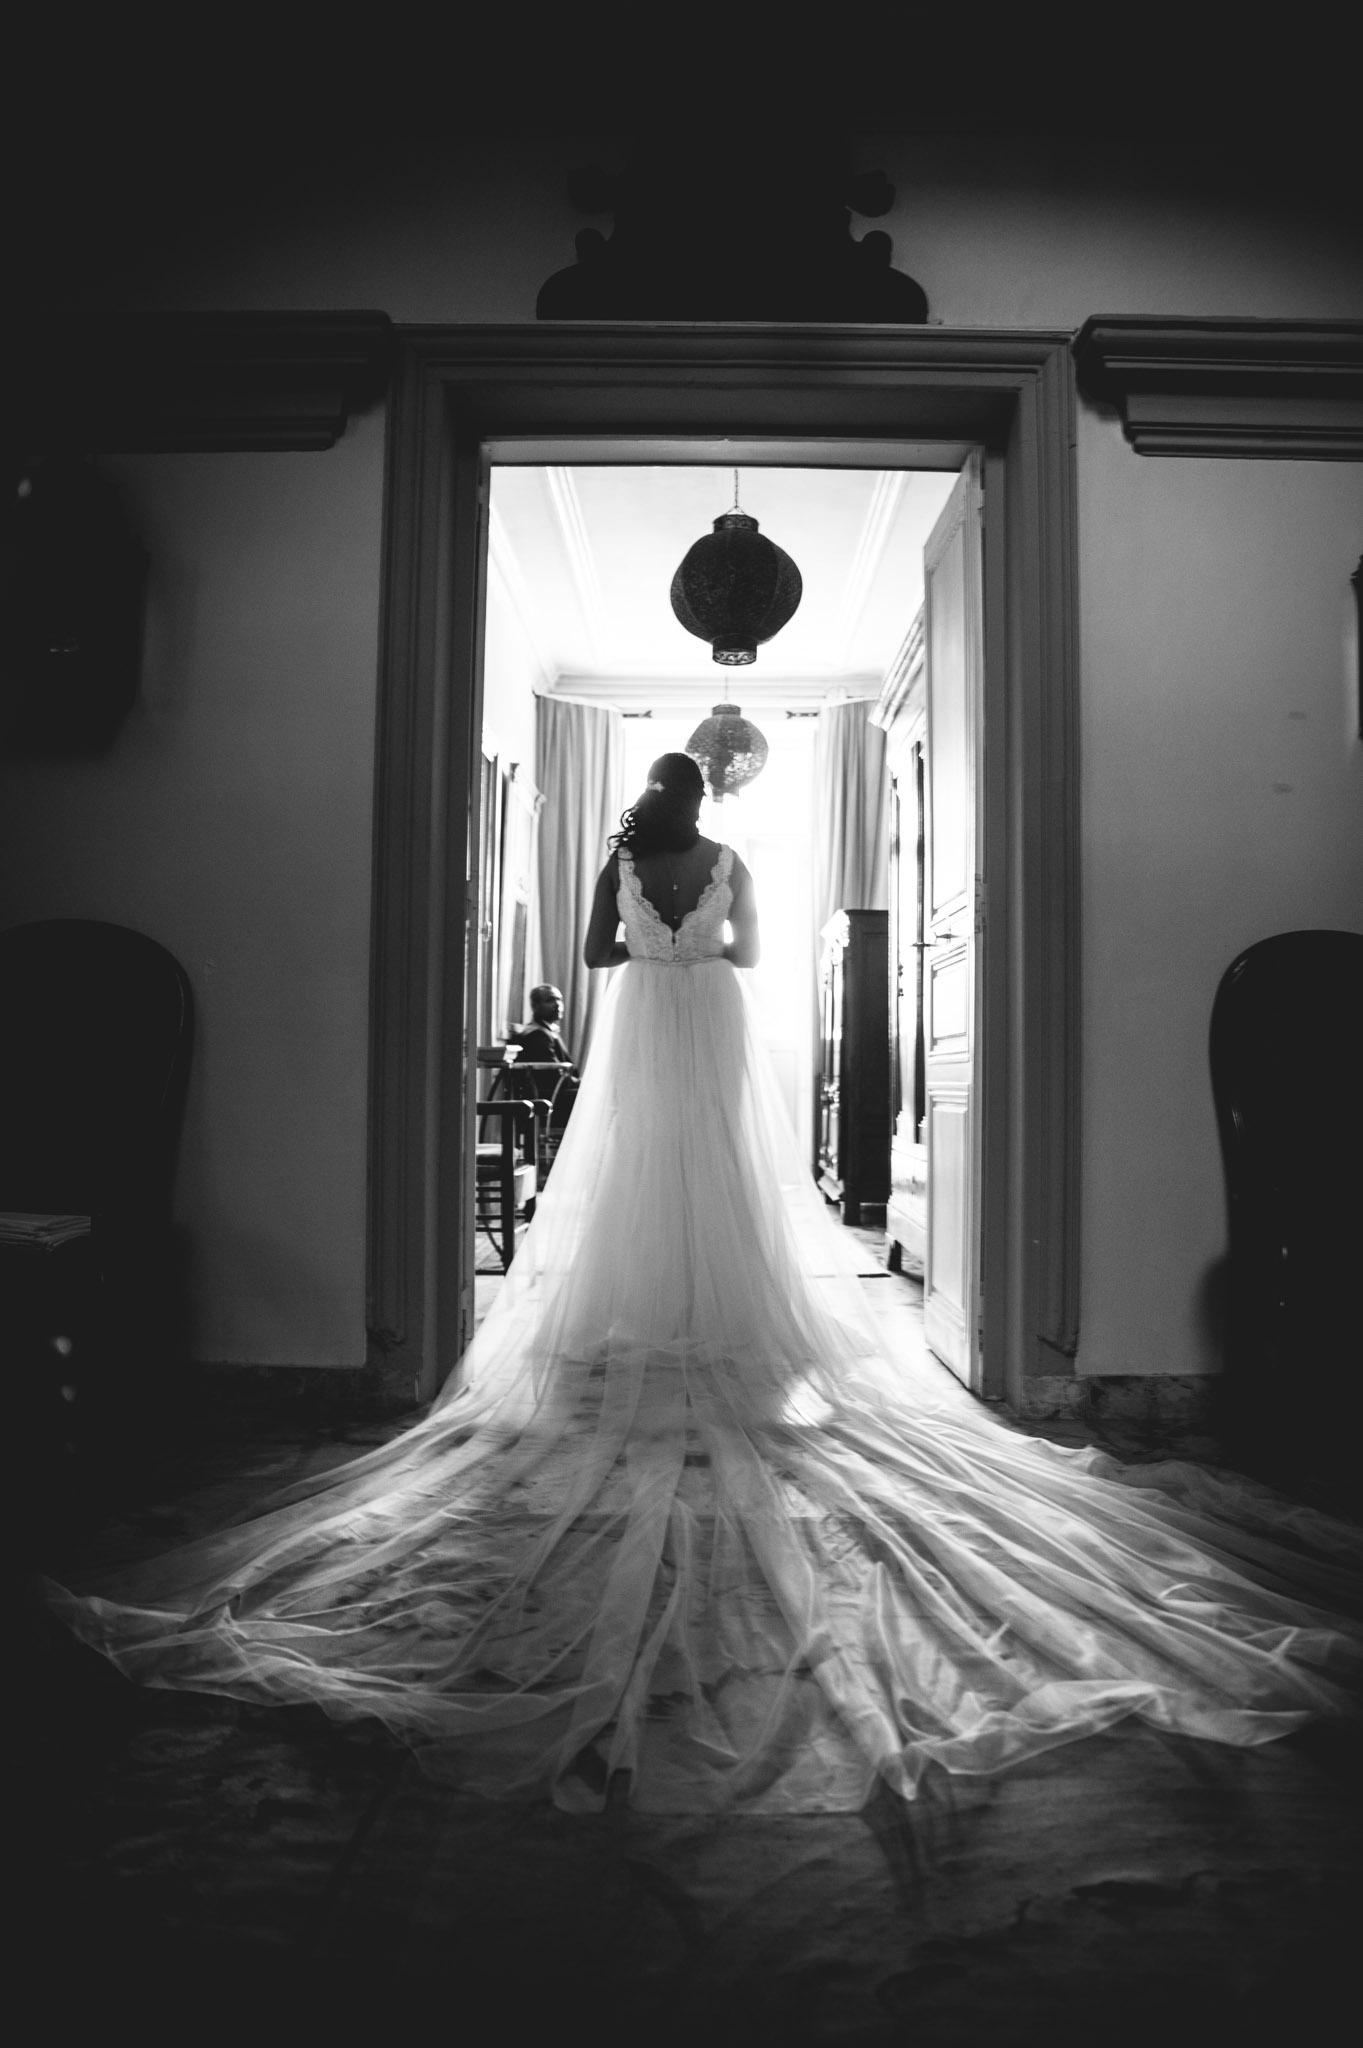 2017-07-15 - DSC_7975 - photographe - mariage - www.lauriediazwedding.com.jpg